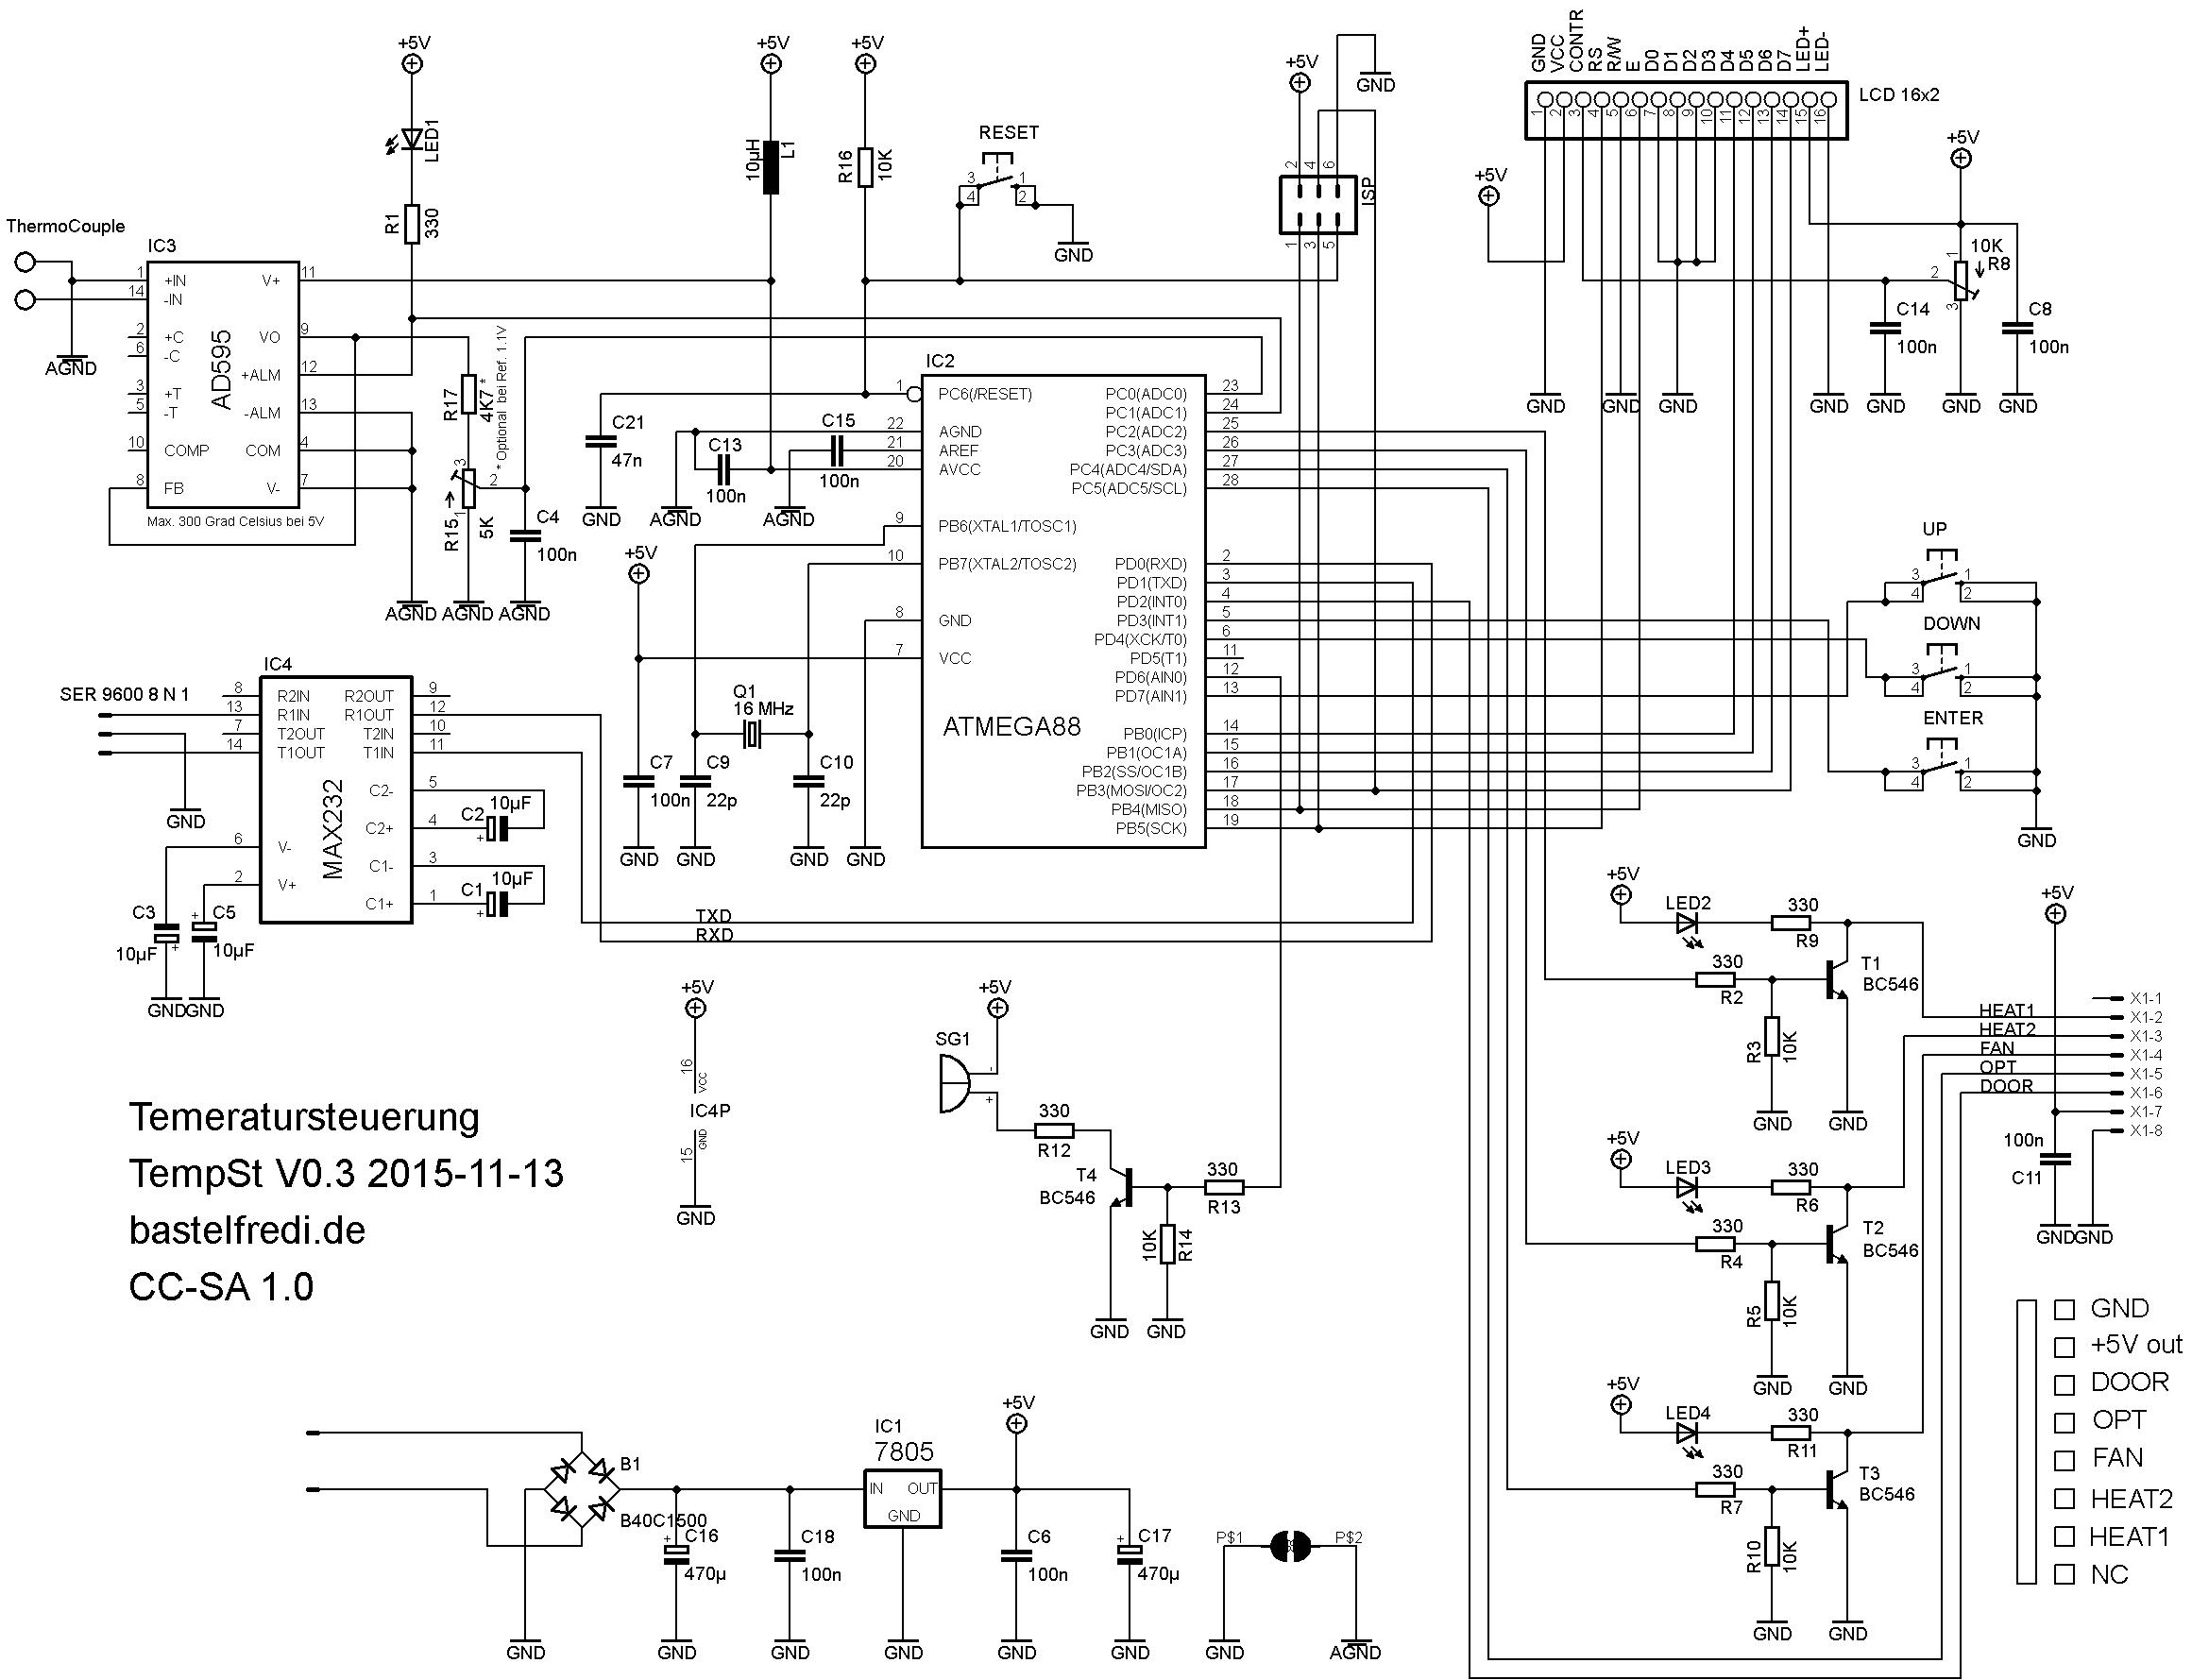 Berühmt Alter Elektroofen Schaltplan Fotos - Elektrische Schaltplan ...